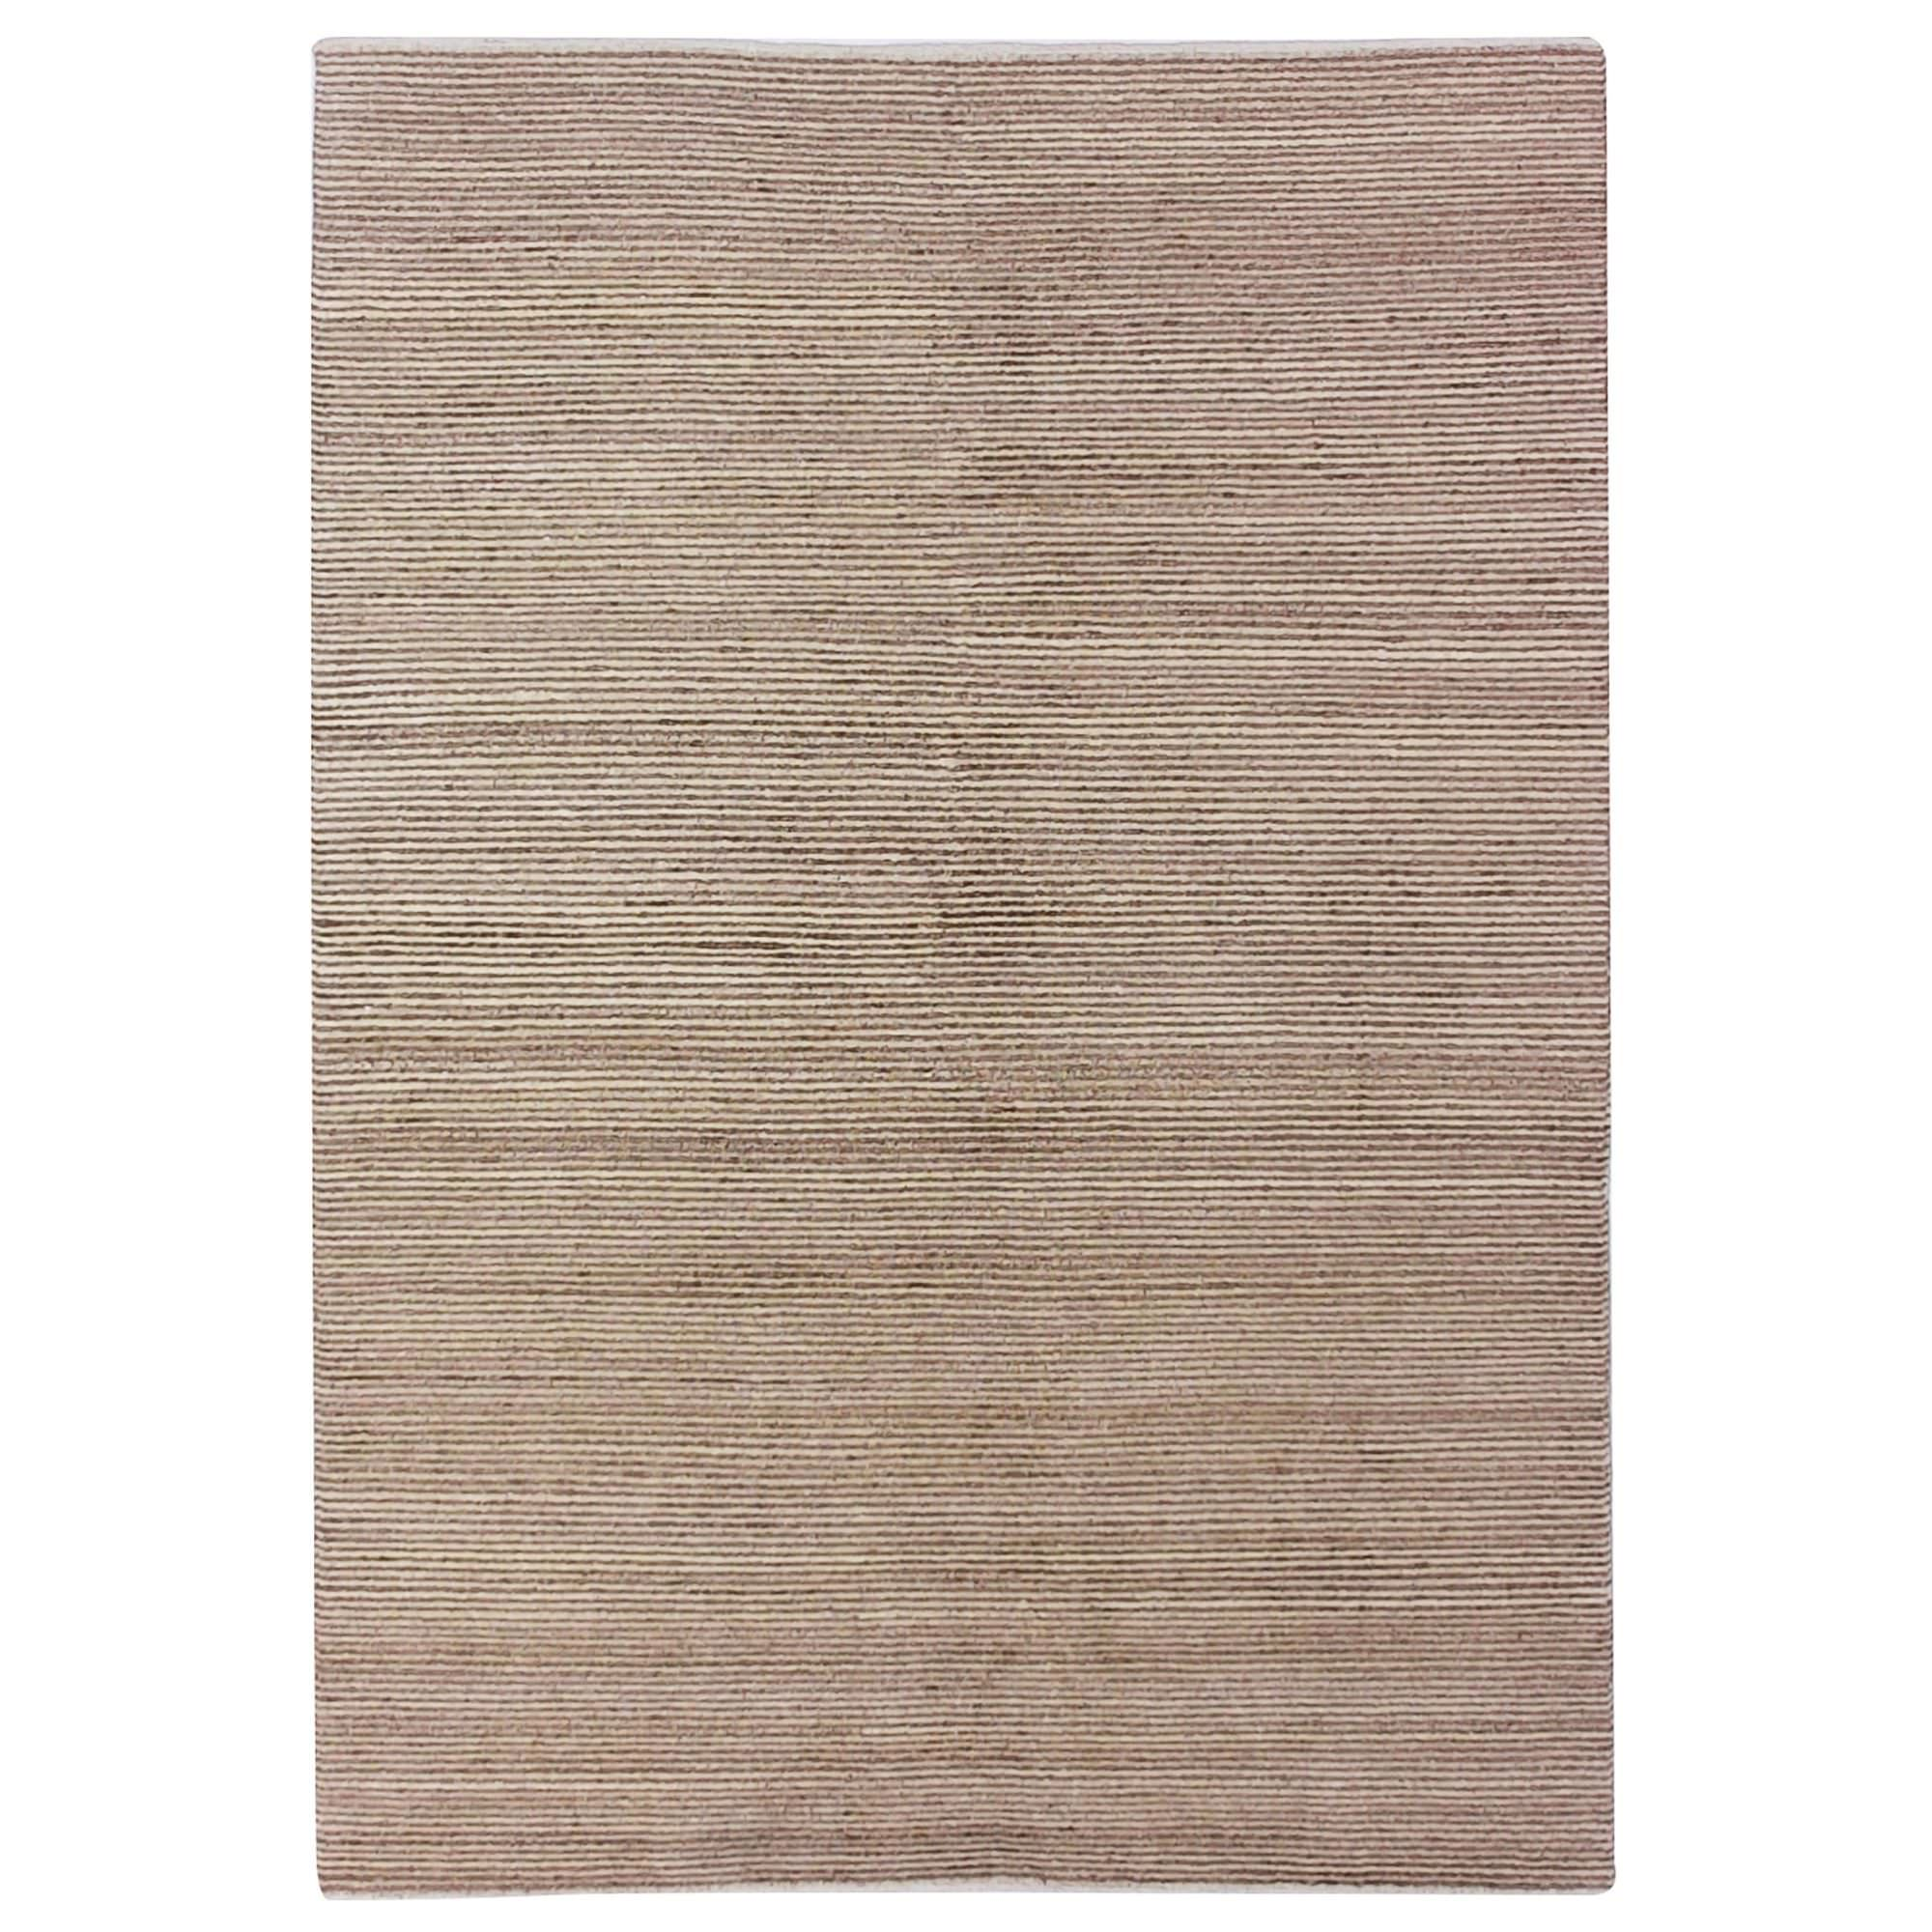 Boheme Hand Tufted Wool Rug, 250x350cm, Tan